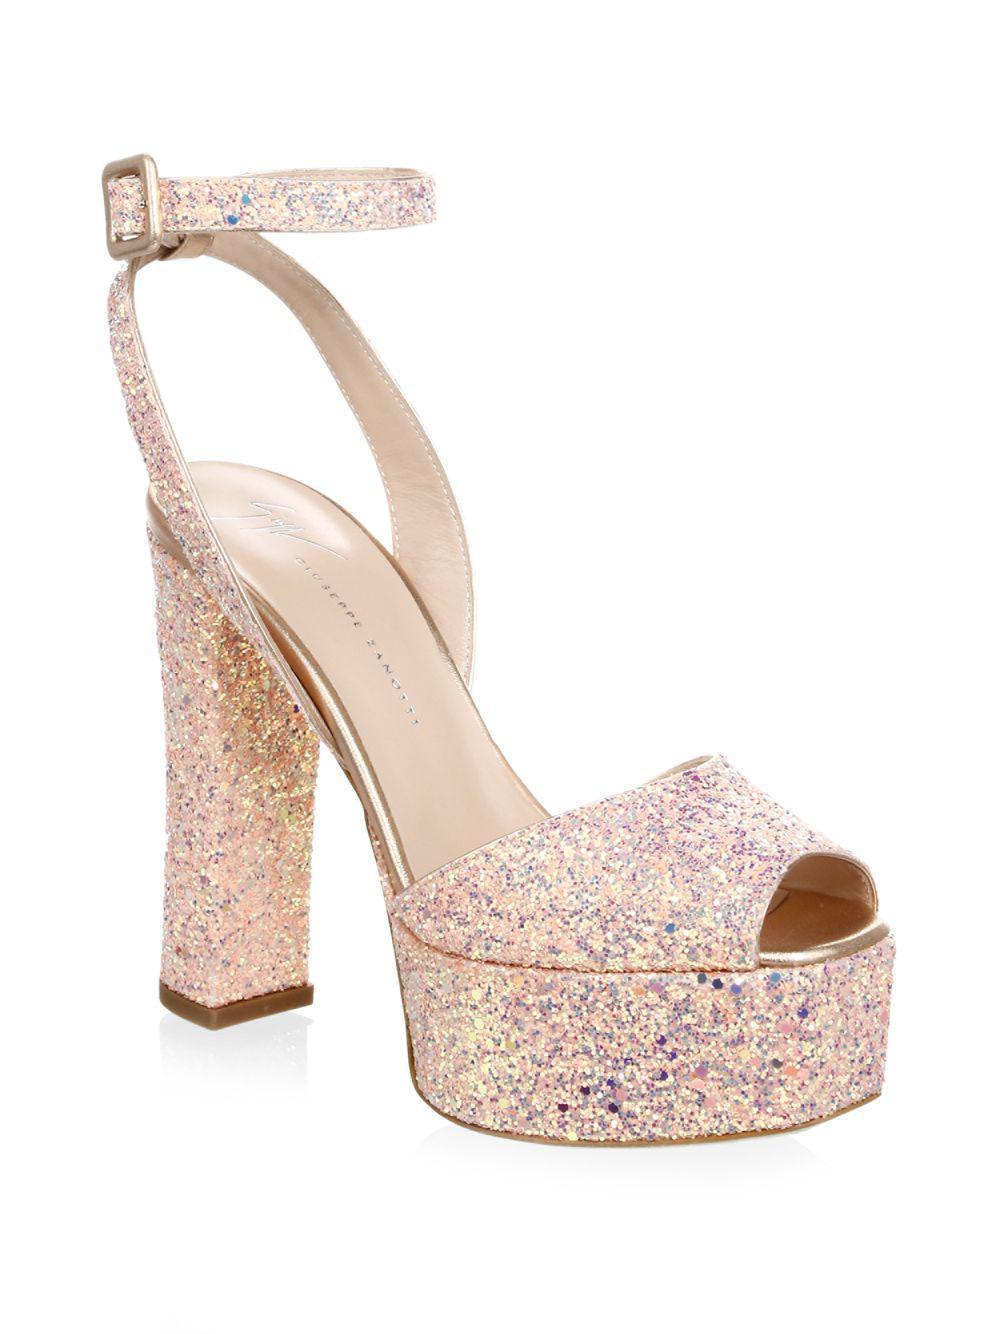 bdf0257d2 Giuseppe Zanotti Lavinia Glitter Leather Platform Sandals - Lyst